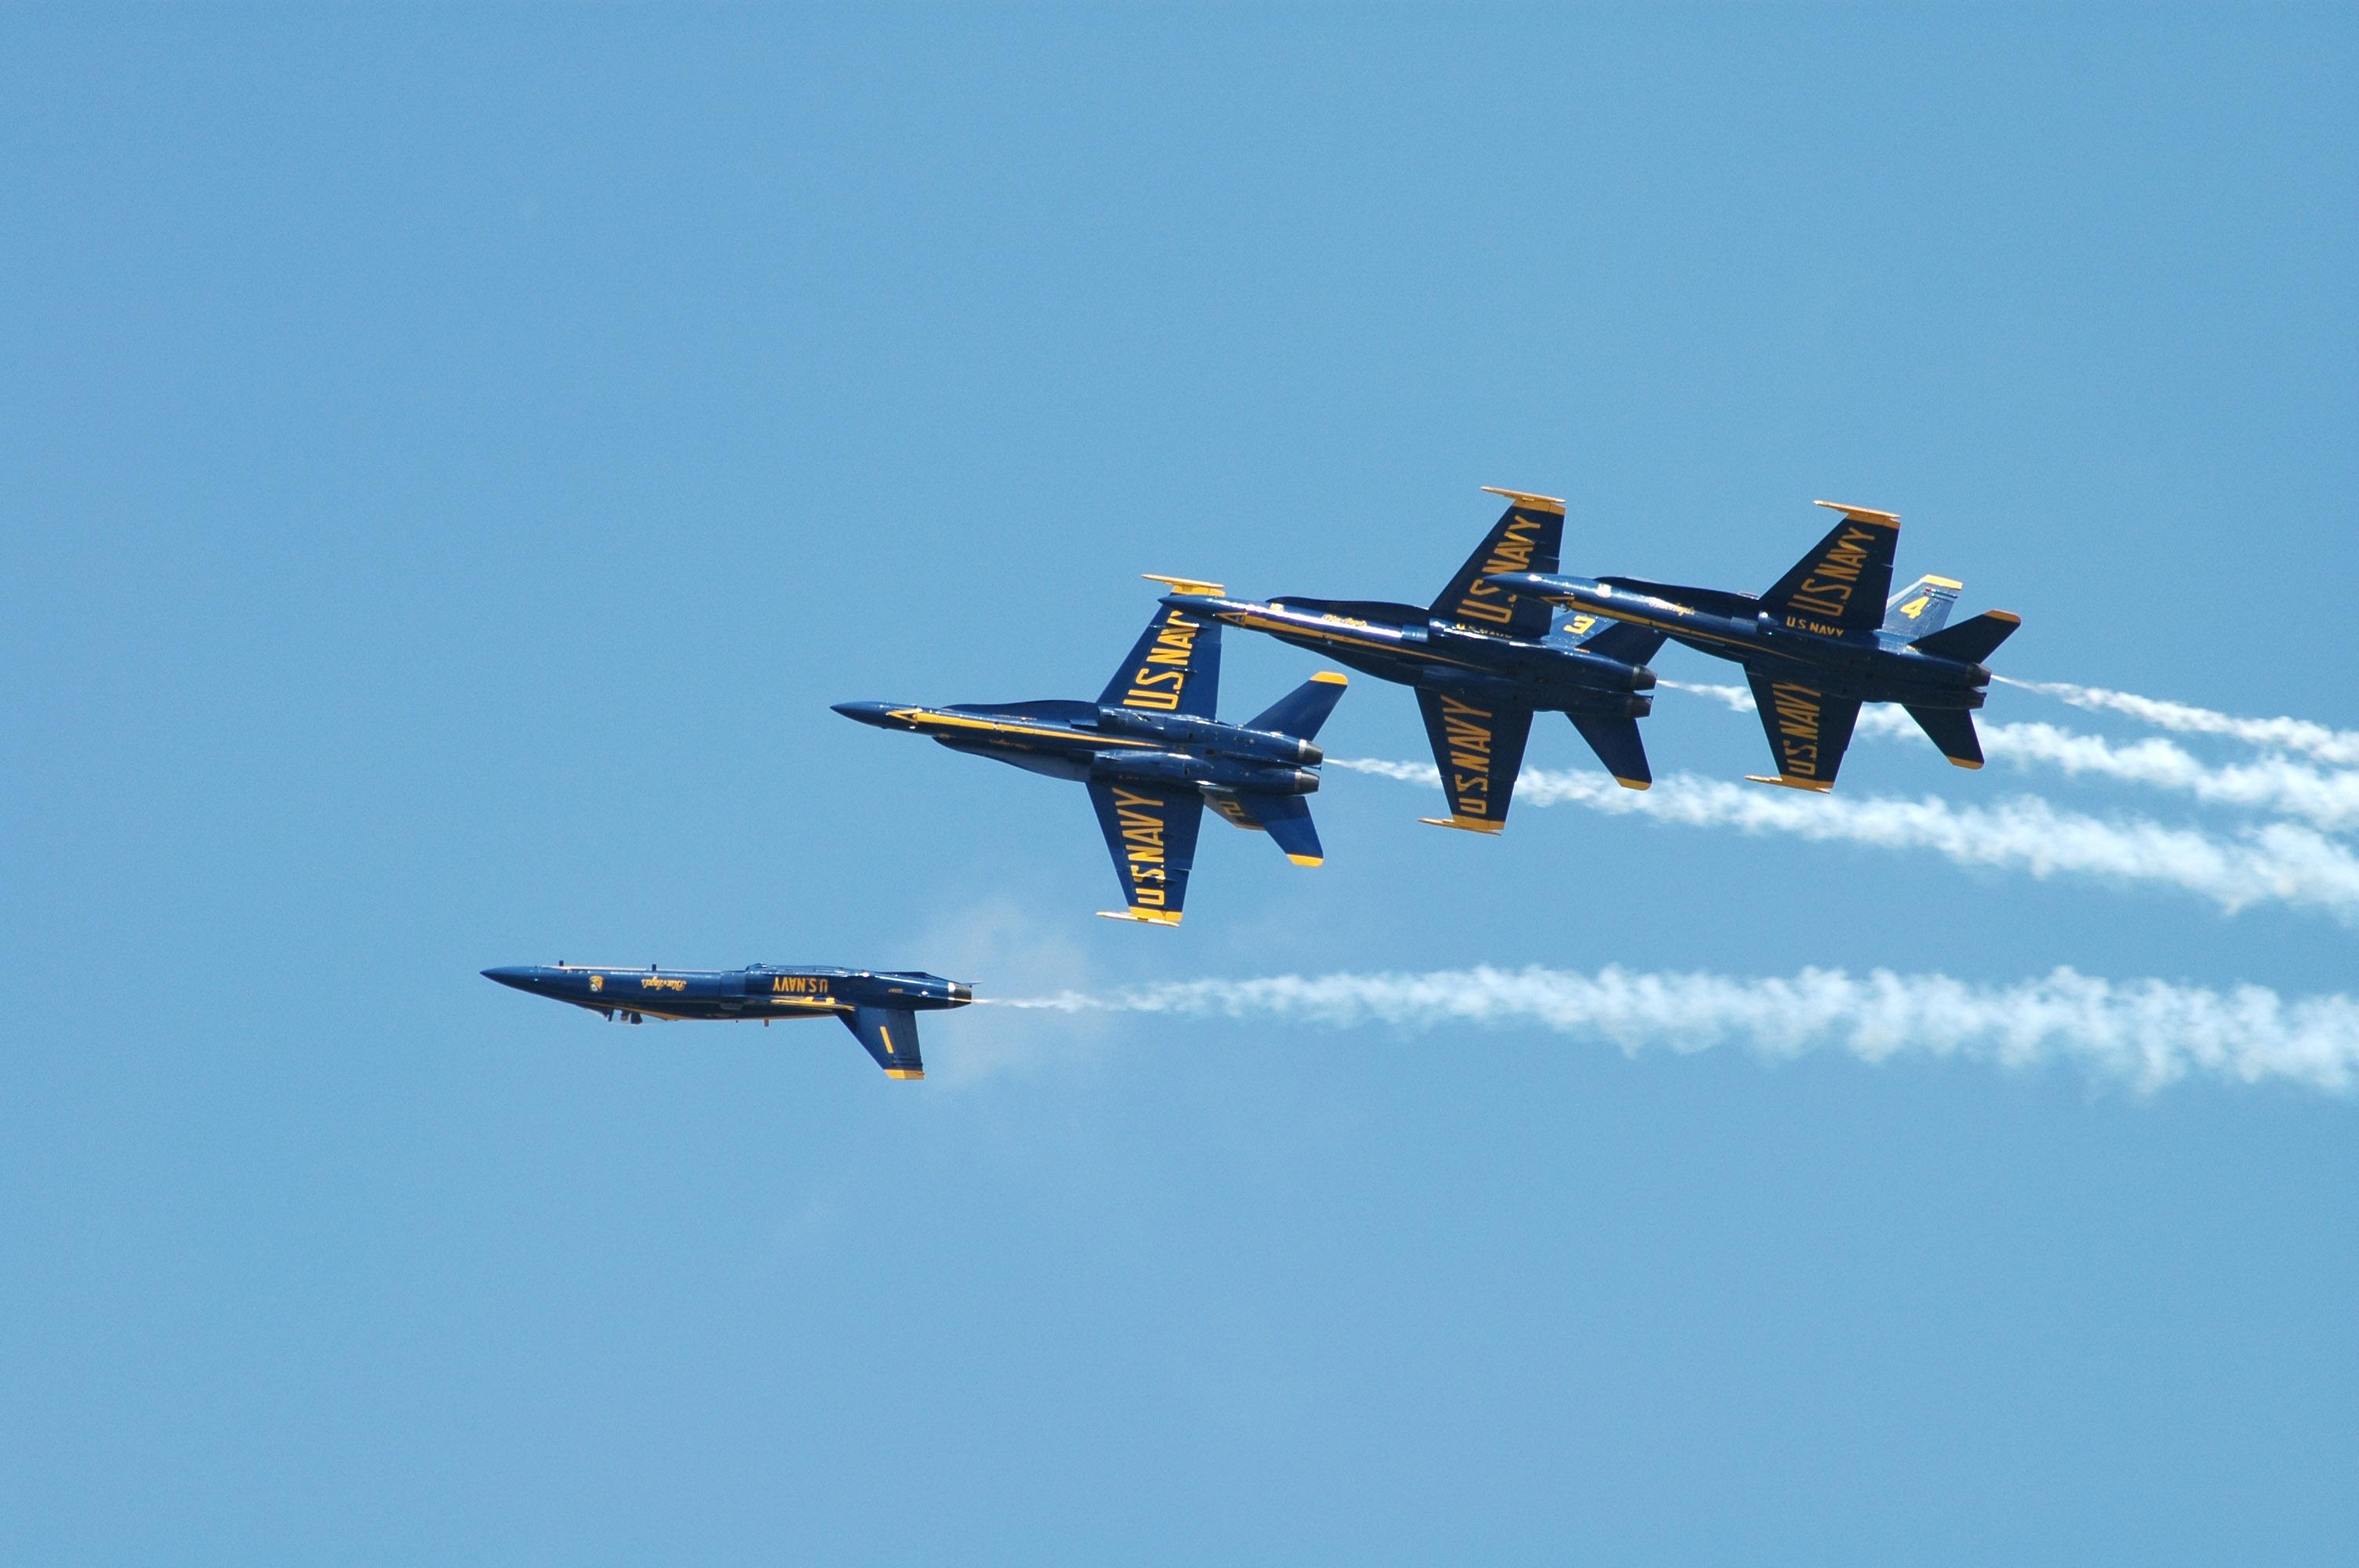 team the blue angels perform a four aircraft break